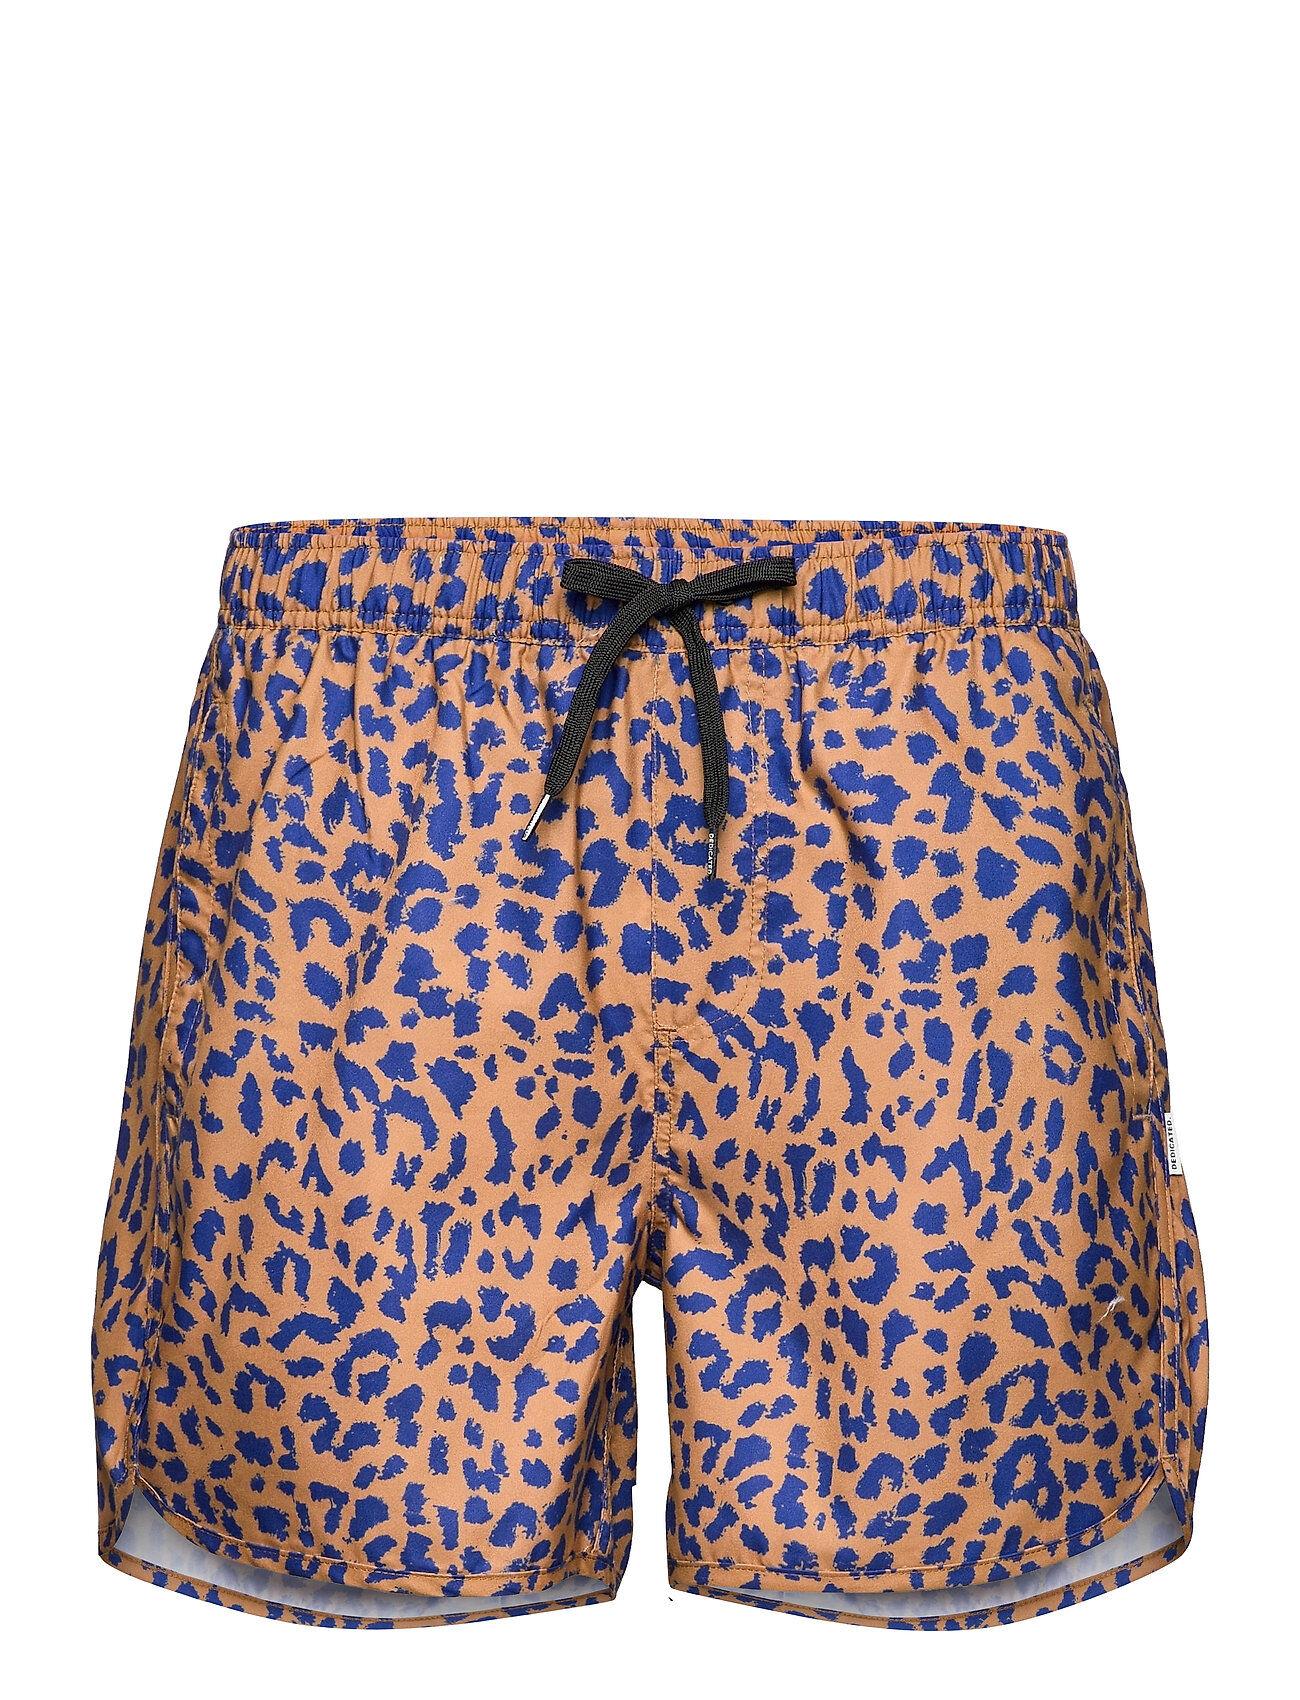 DEDICATED Swim Shorts Sandhamn Leopard Light Brown Badeshorts Brun DEDICATED